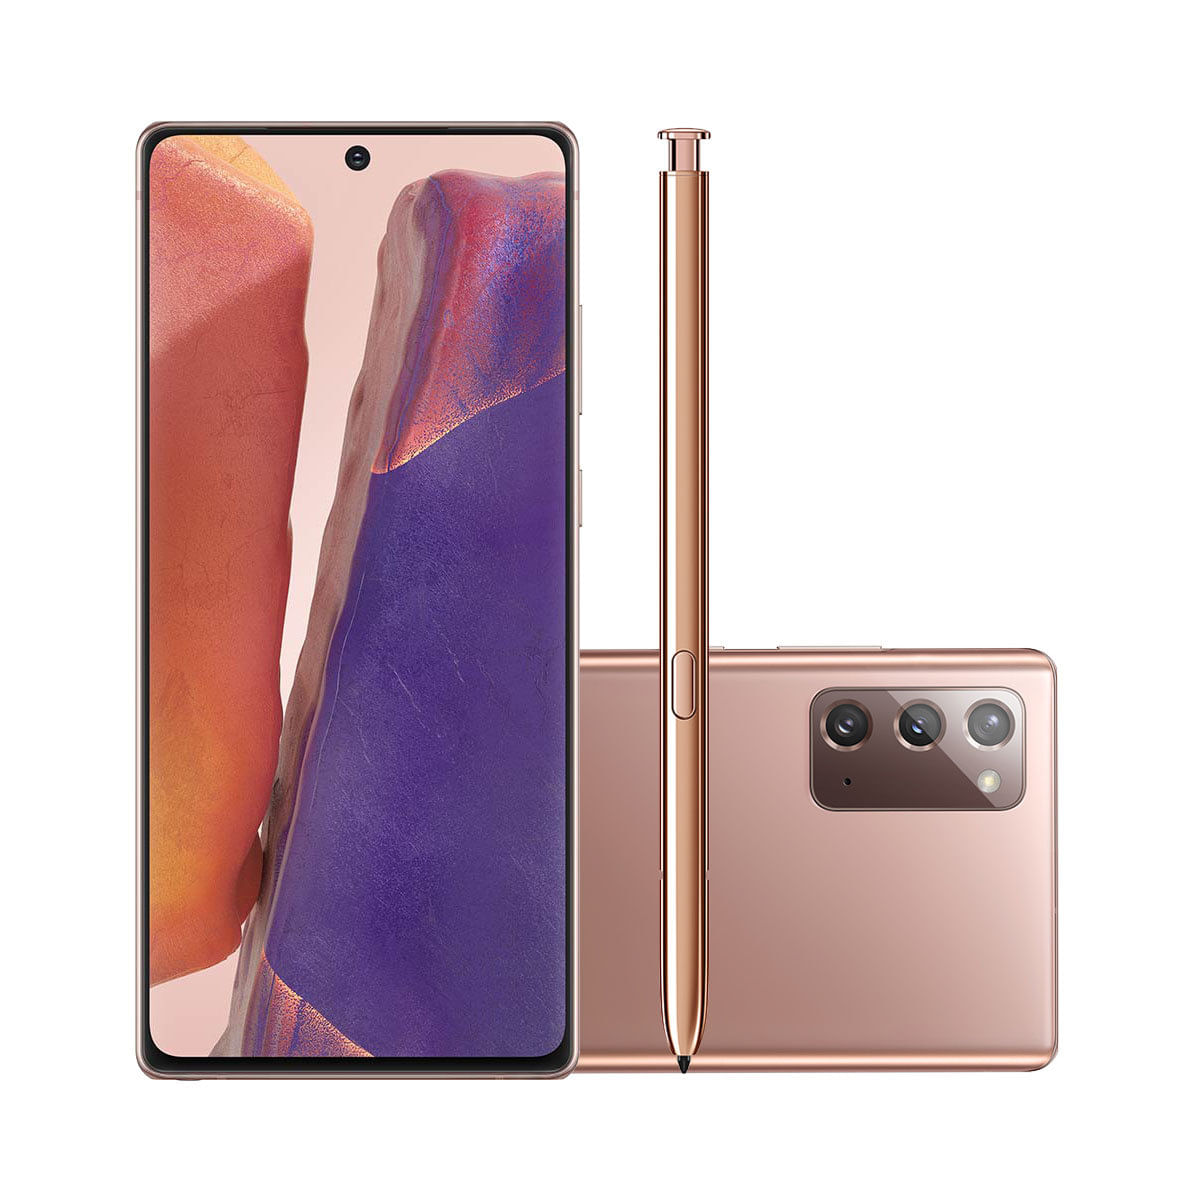 "Smartphone Samsung Galaxy Note 20 256GB Mystic Bronze 5G Tela 6.7"" Câmera Tripla 64MP Selfie 10MP Android 10.0"